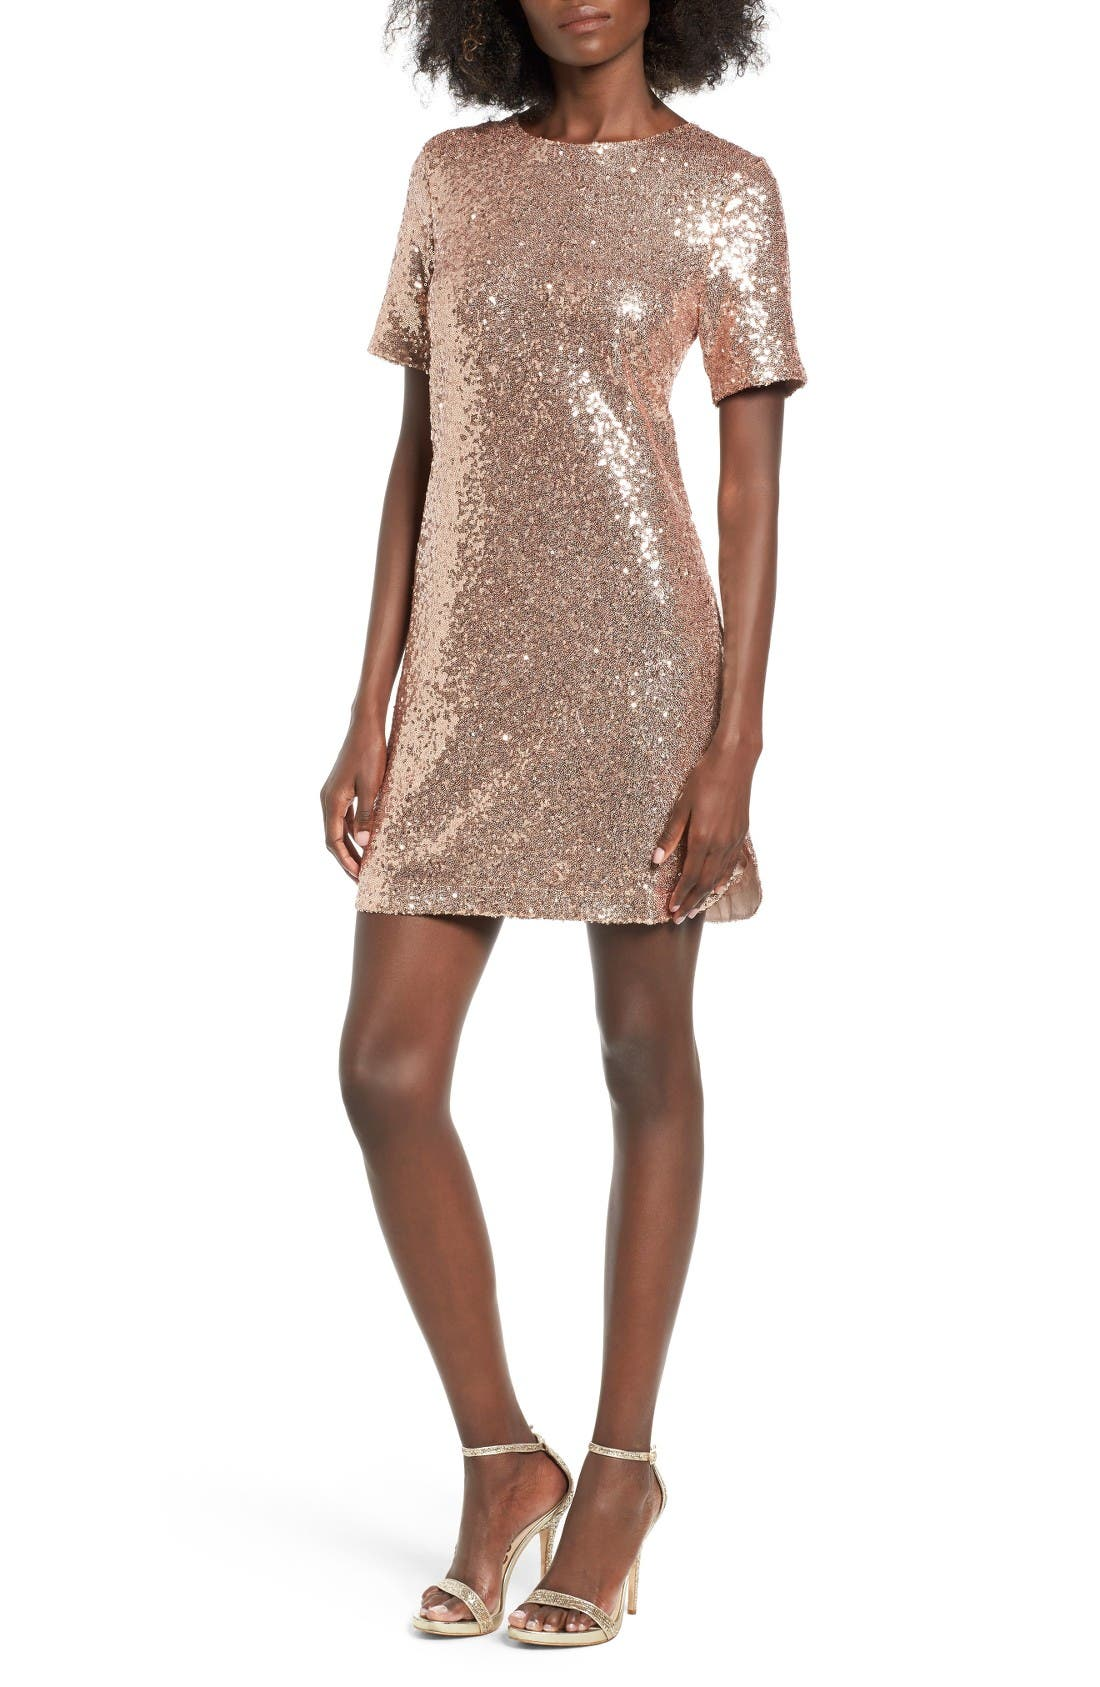 Main Image - Soprano Sequin T-Shirt Dress